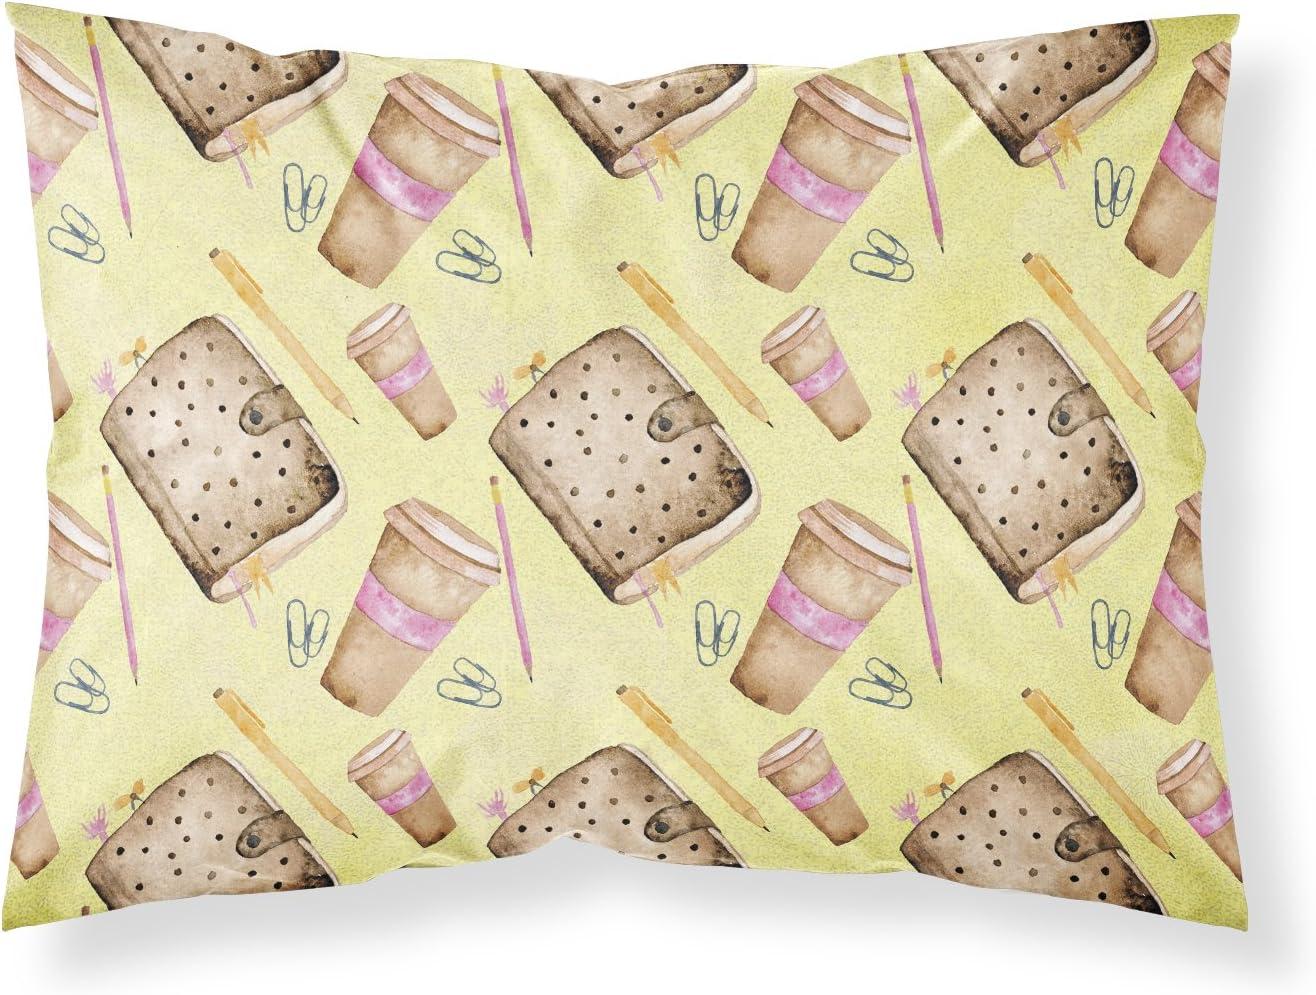 Caroline's Treasures BB7537PILLOWCASE Watercolor Coffee and Journal Fabric Standard Pillowcase, Standard, Multicolor